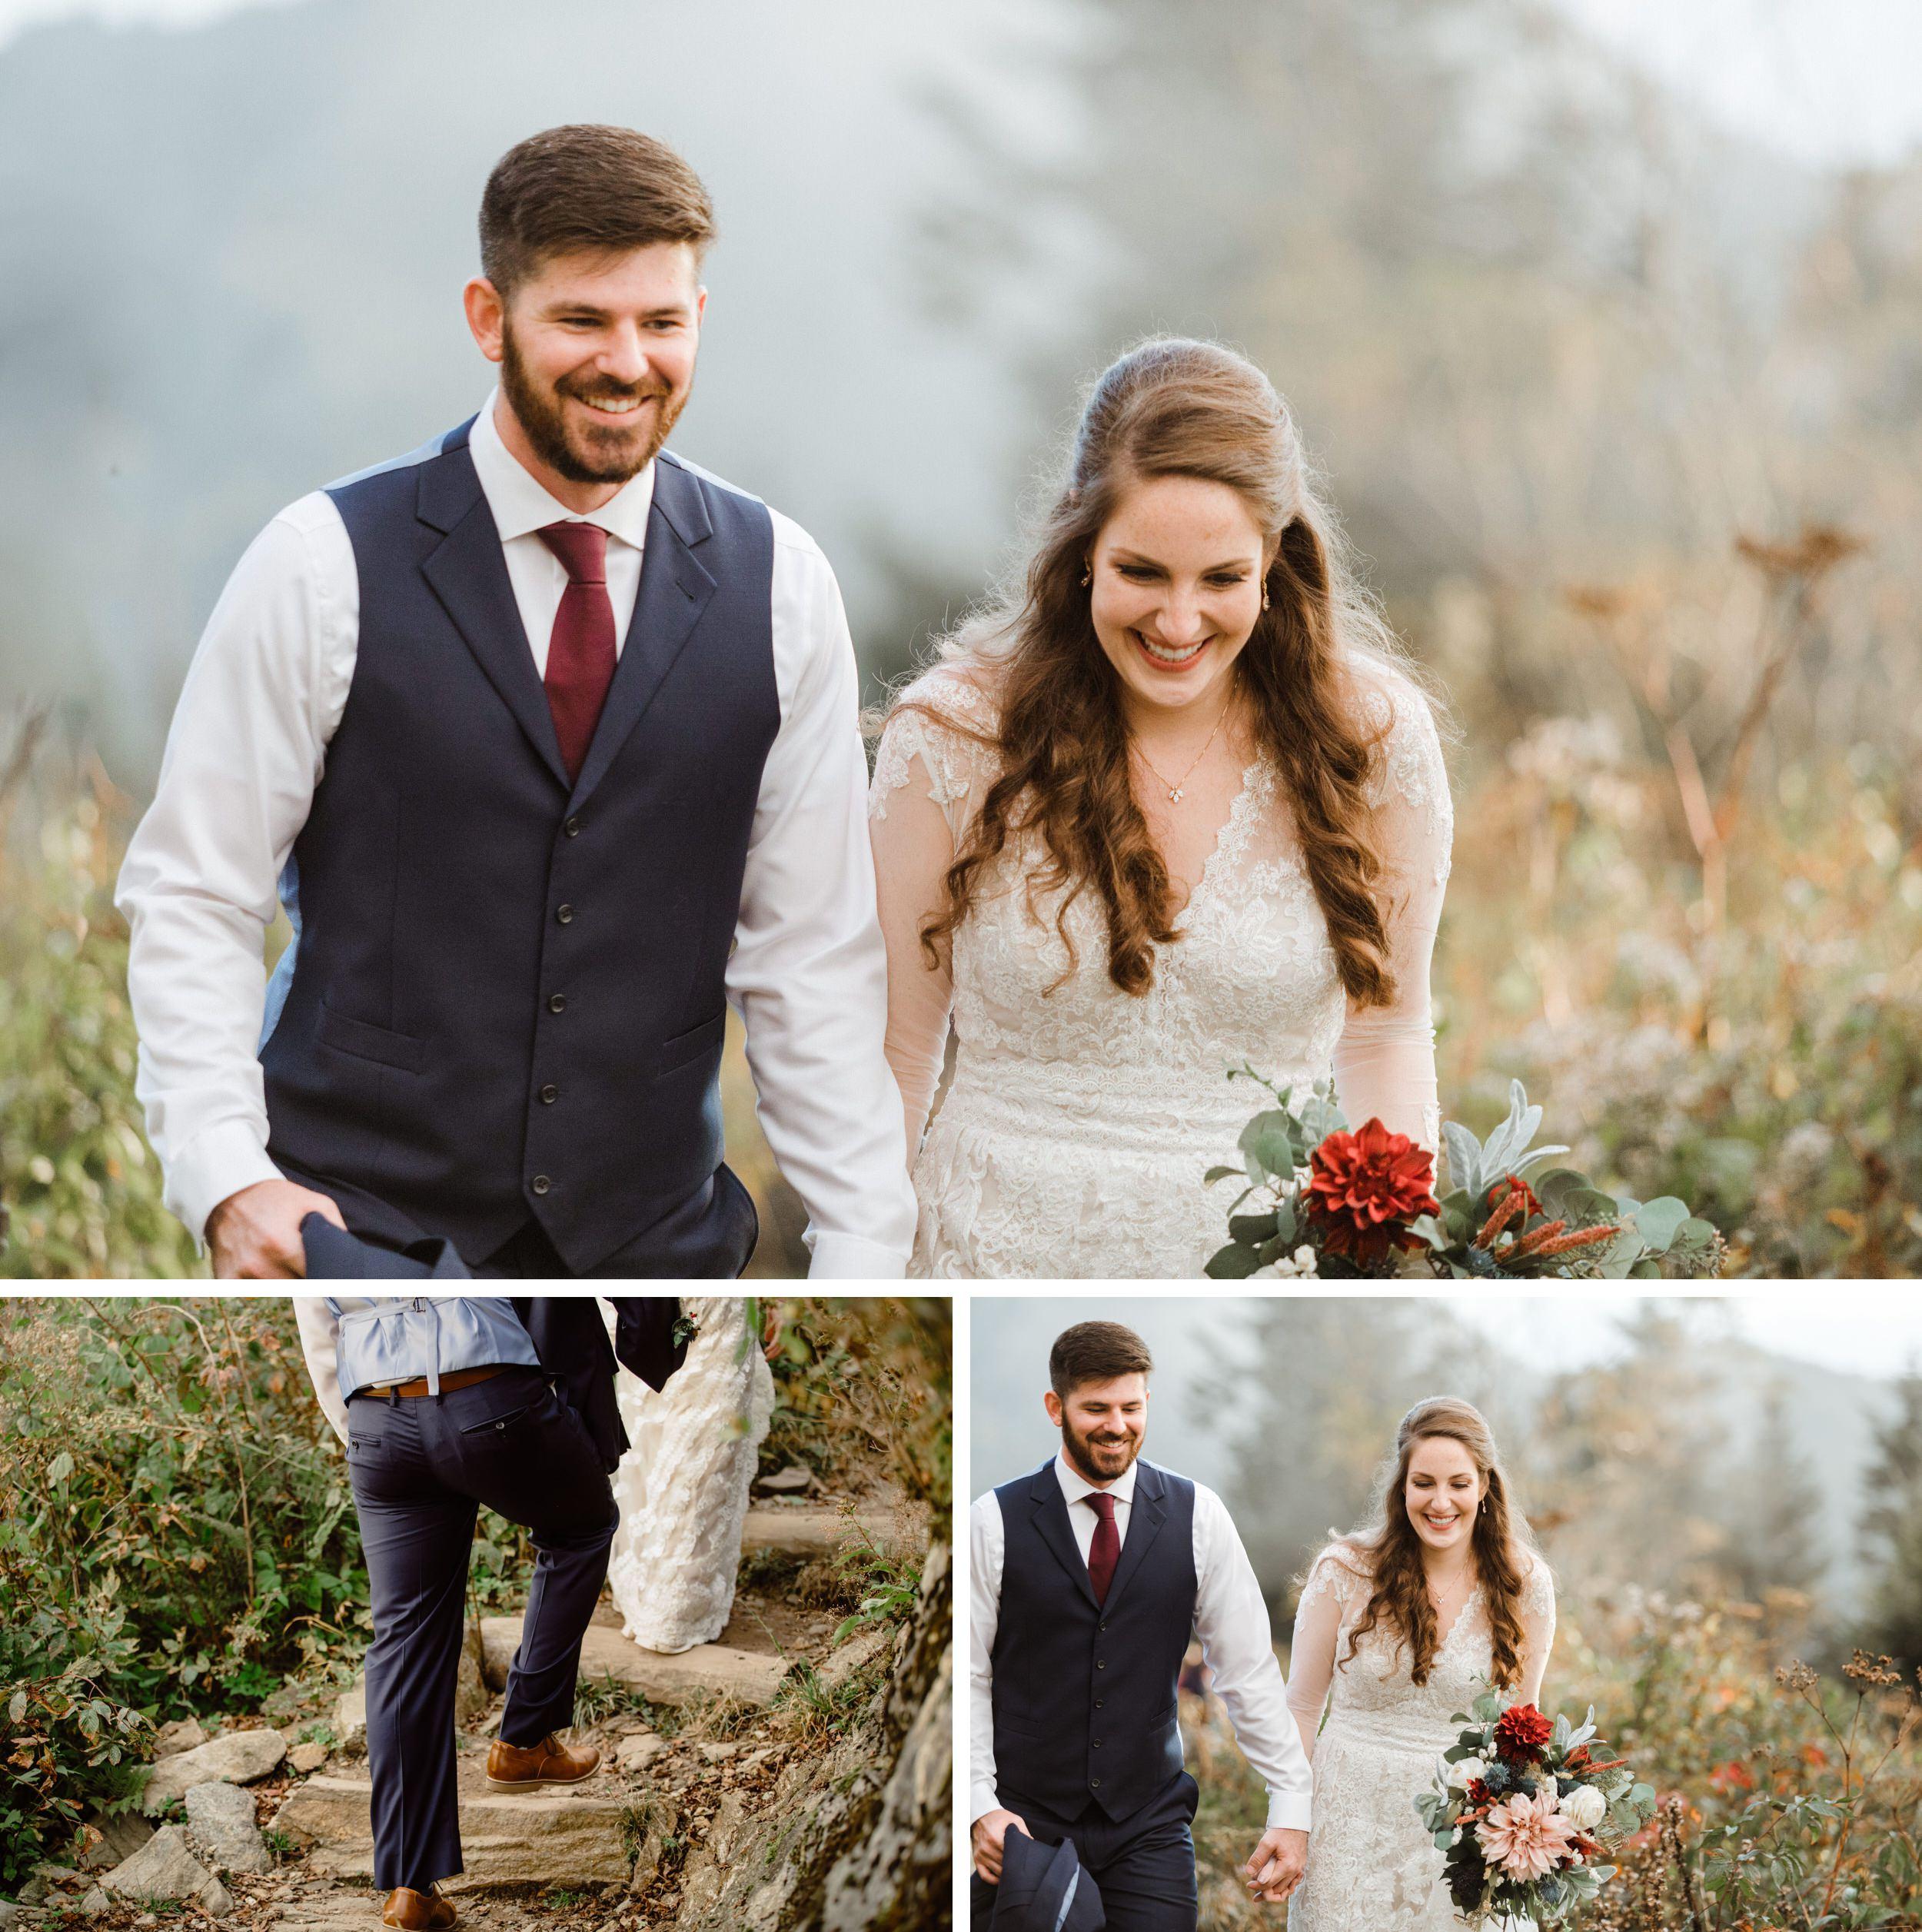 Great Smoky Mountain National Park Elopement- Cole + Rachel- Photographer Shaina DeCiryan-11.20185.jpg